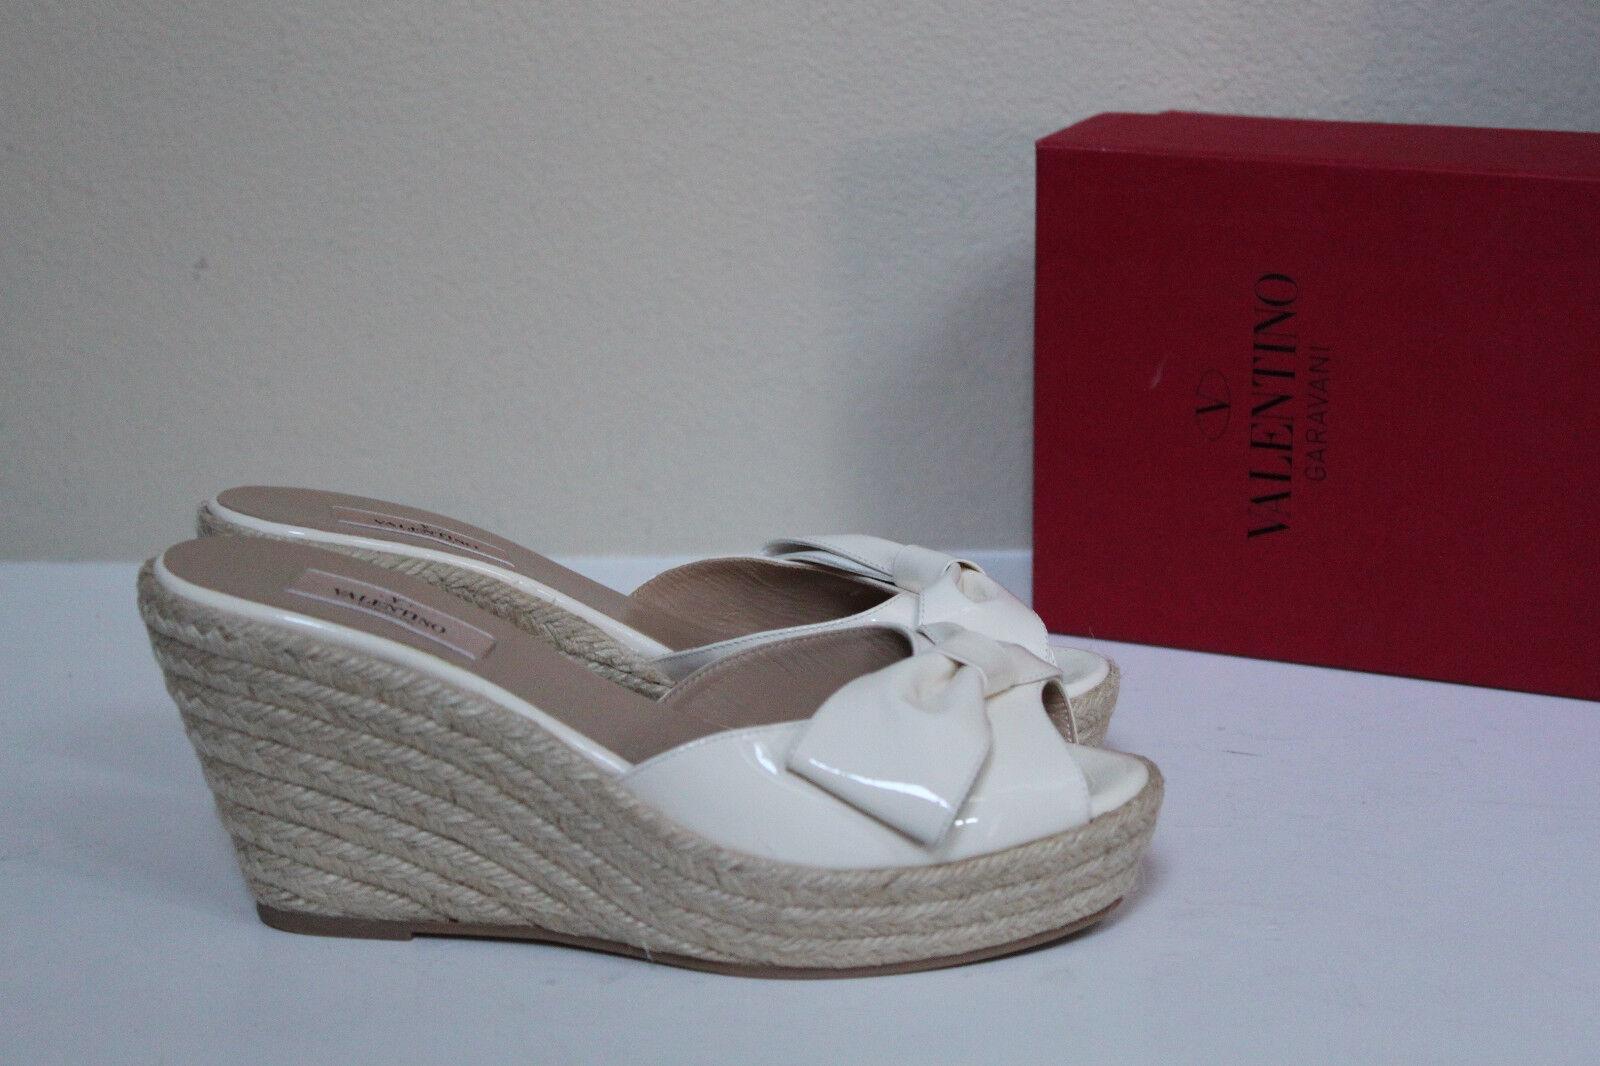 New 8.5 / 39 Valentino Bow White Patent Leather Wedge Mena Espadrille Slide Shoe